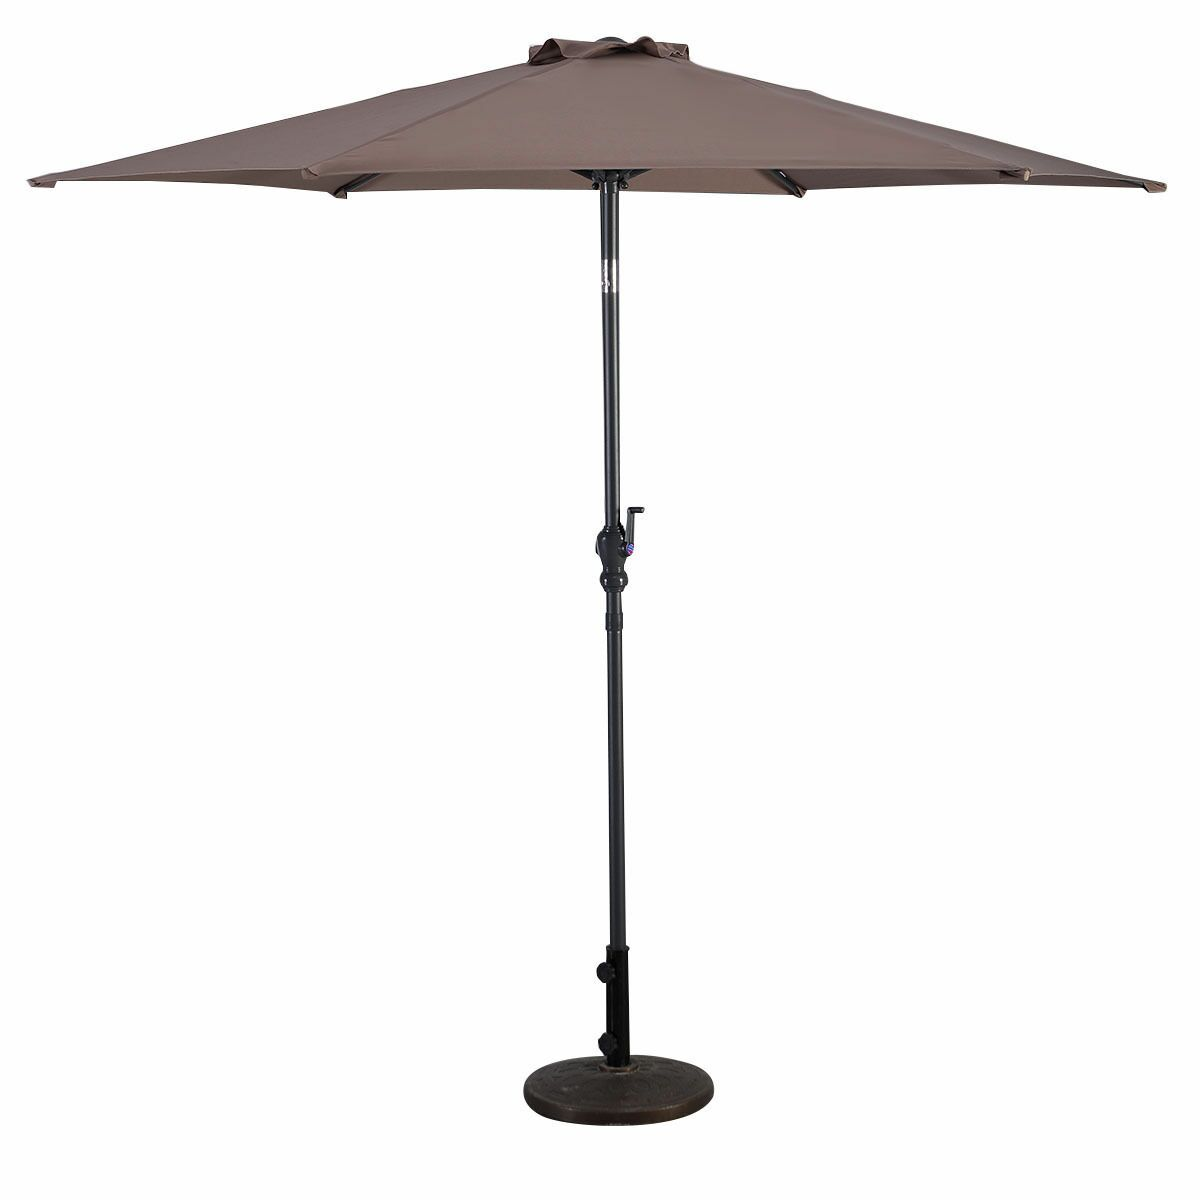 Bacon Patio Market Umbrella Open Umbrella Width: 120